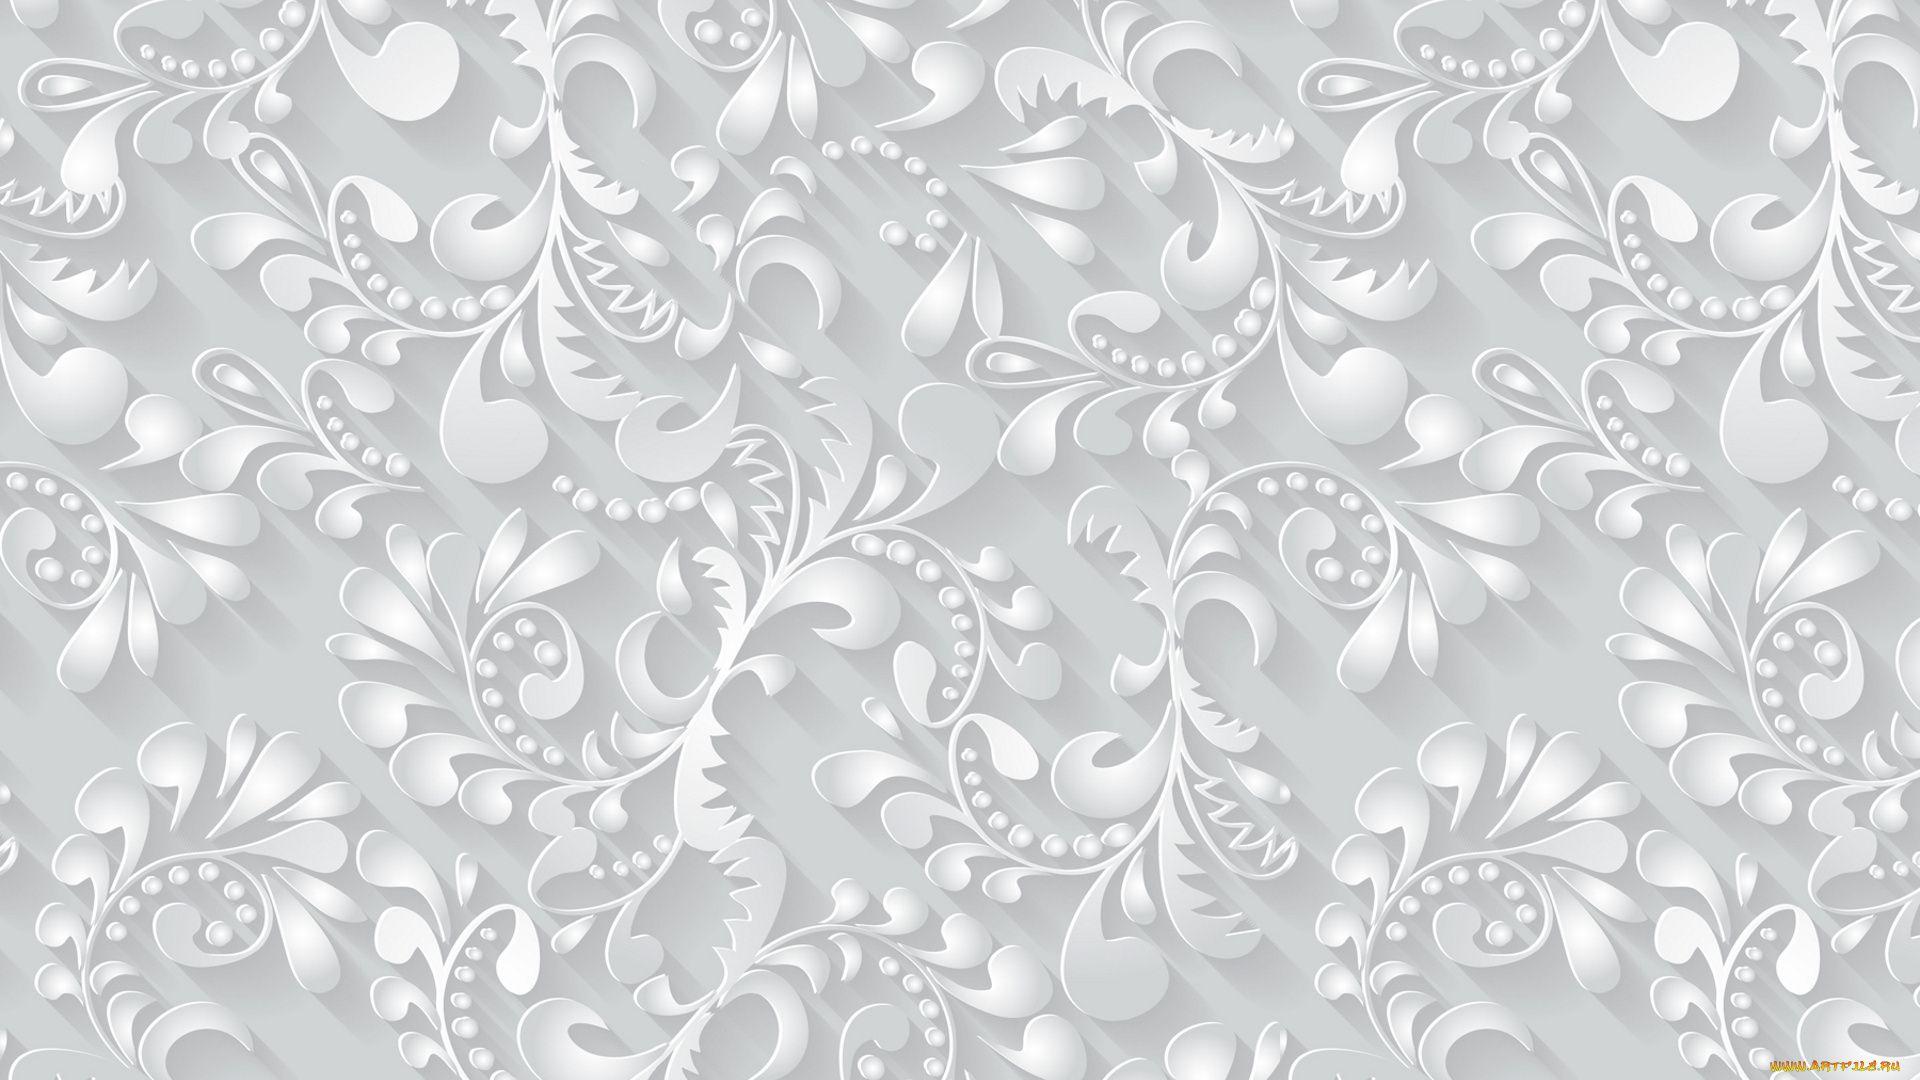 Website Background Texture 1080p